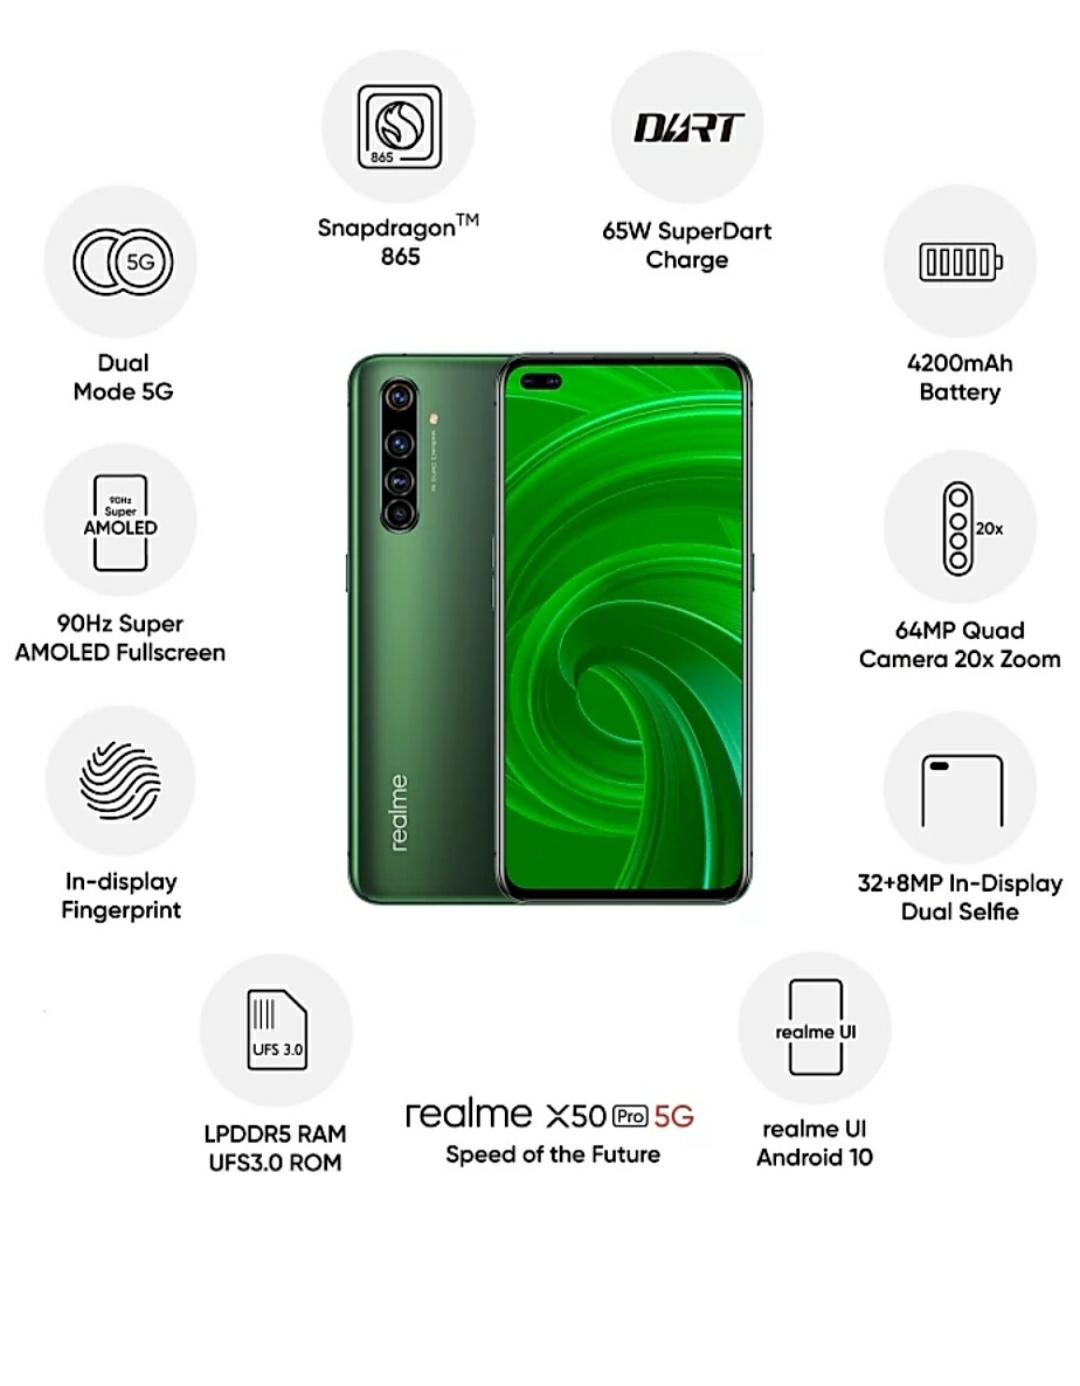 realme x50 pro camera sensor, Realme x50 pro 5G specs,